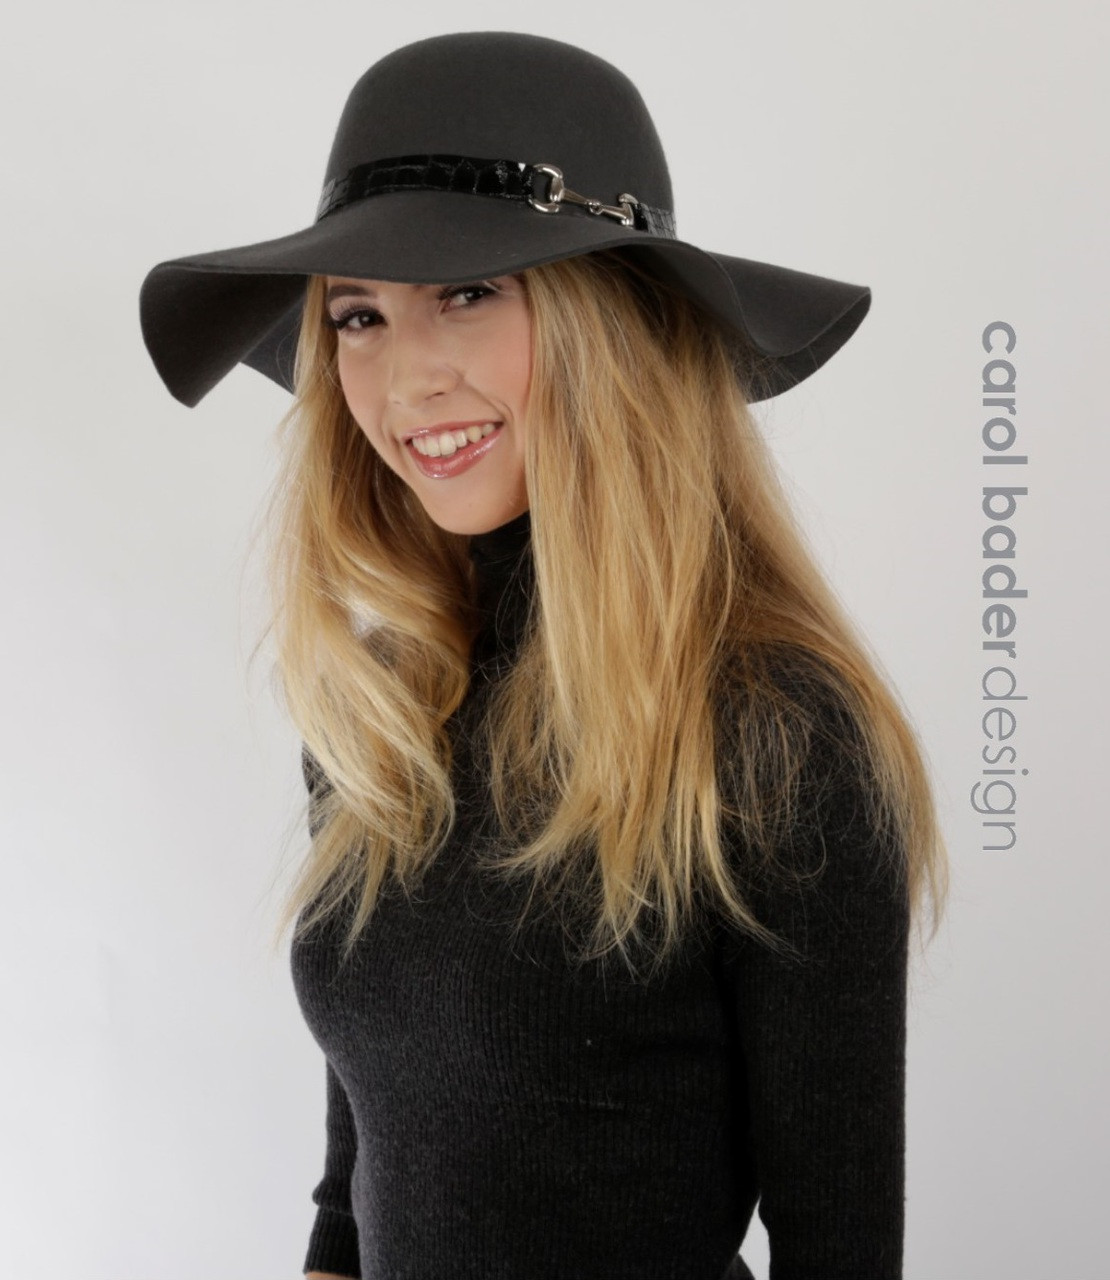 Floppy Felt hat with bit. Price   140.00. Charcoal with black trim and bit. 82f9b5b193a3